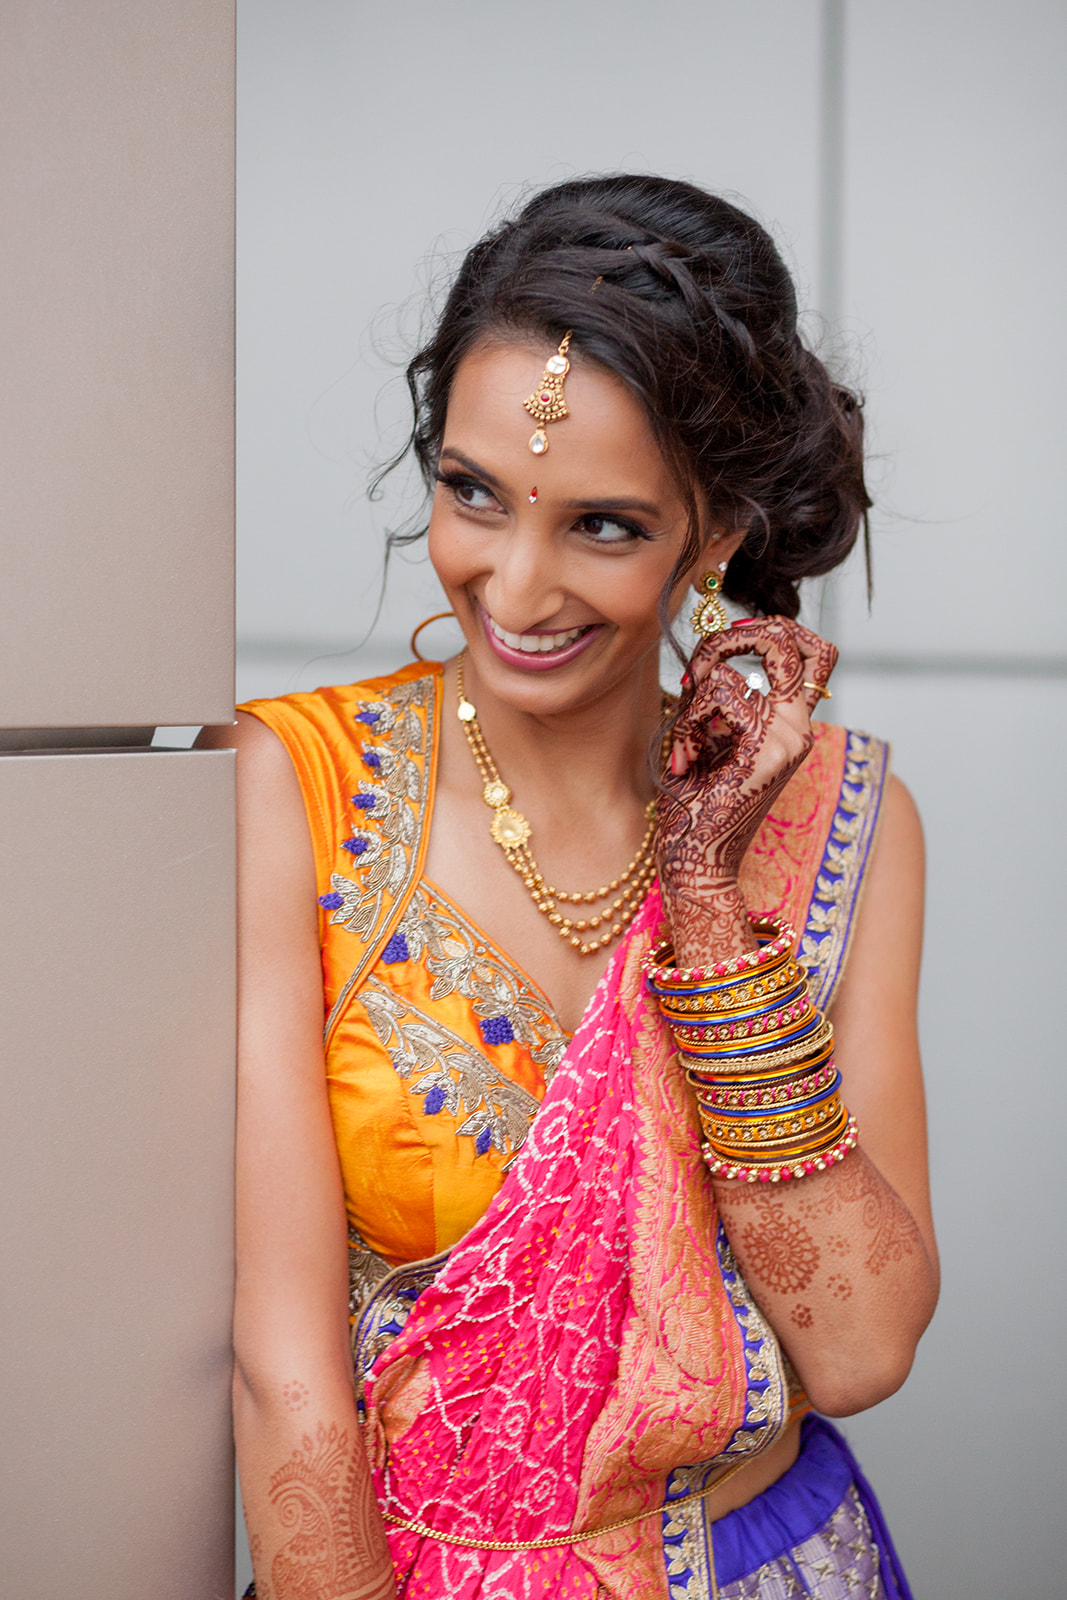 Le Cape Weddings - Monica and Pratik - Sangeet 00355.jpg